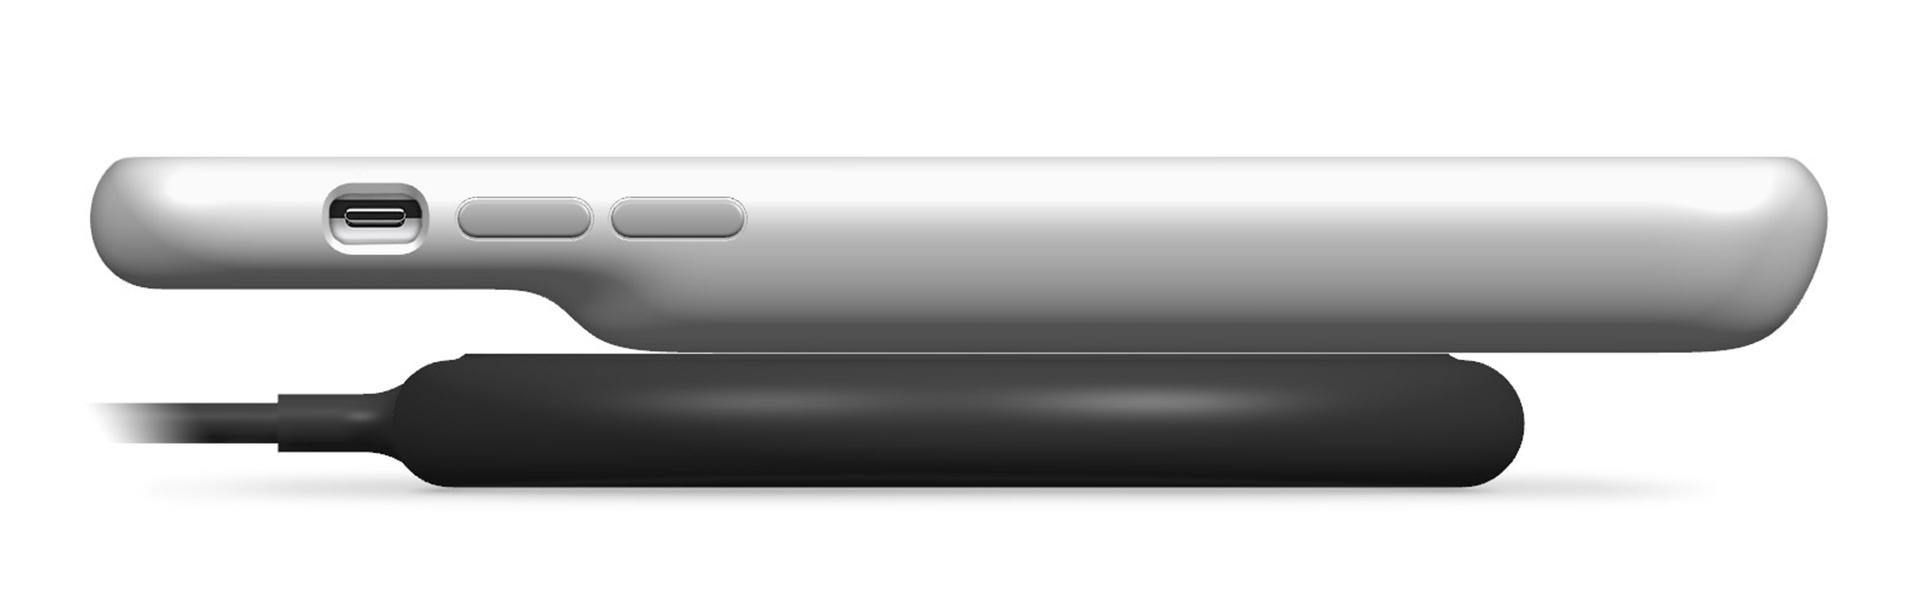 iPhone スマートバッテリーケース Qi充電 イメージ